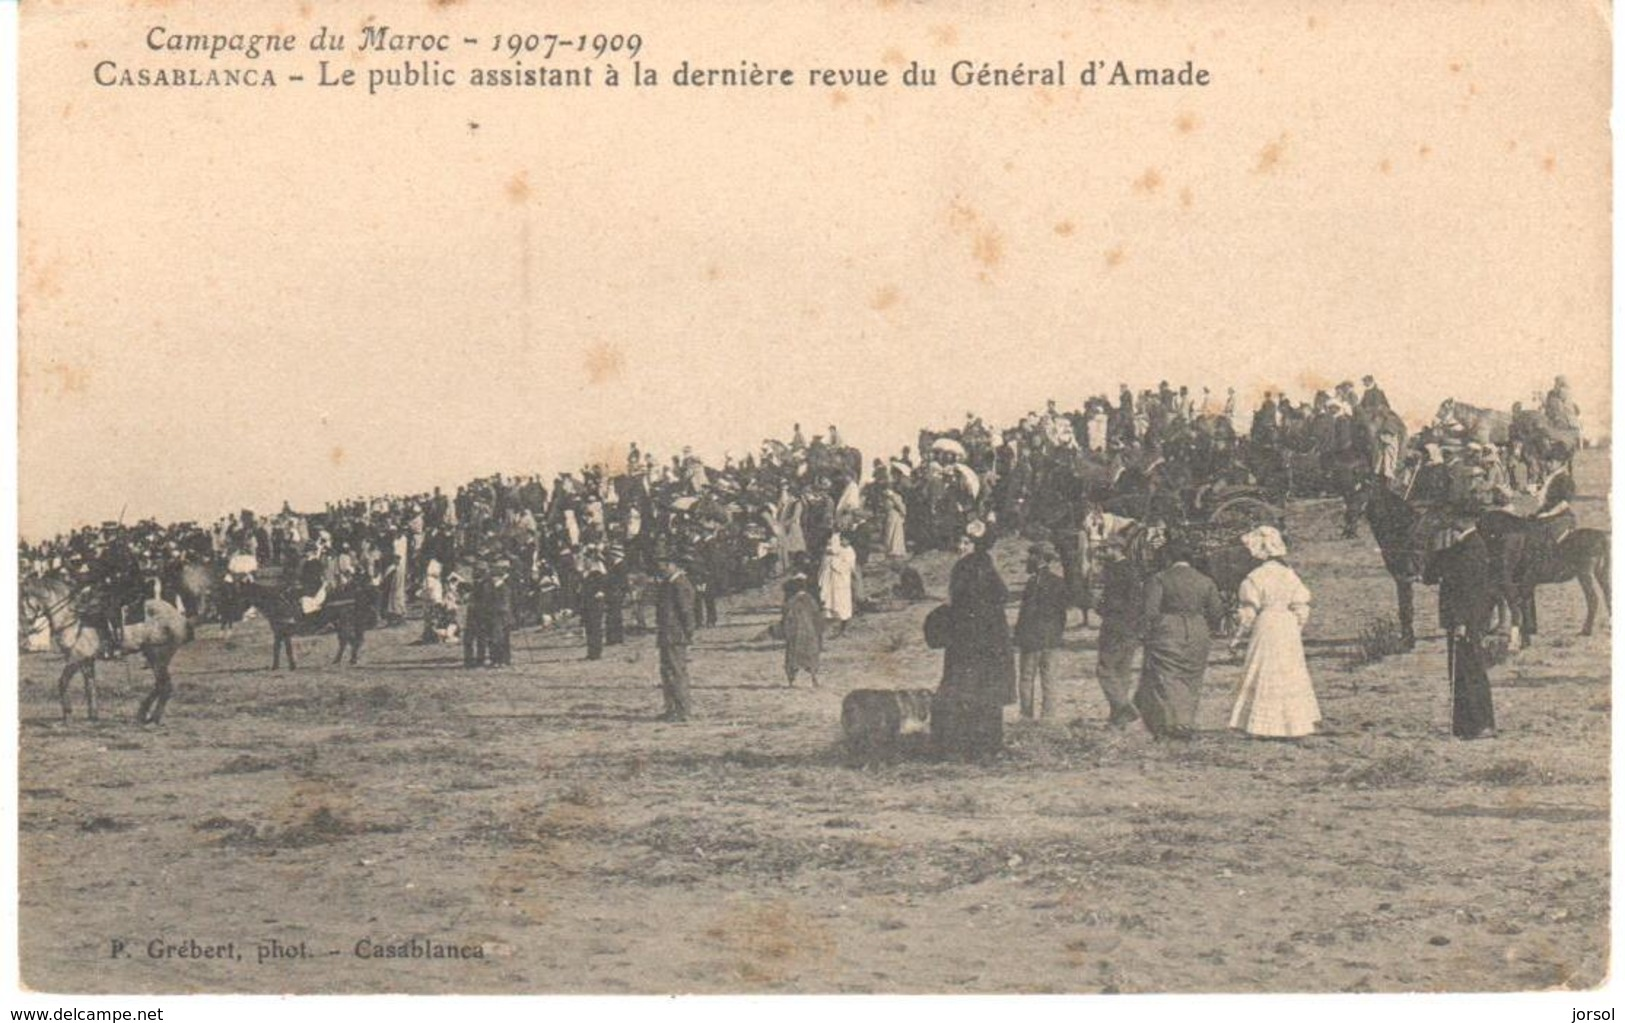 POSTAL   -CASABLANCA  -MARRUECOS  -CAMPAGNE DU MAROC 1907-1909LE PUBLIC ASSISTANT REVUE GÉNÉRAL D'ARMADE - Casablanca